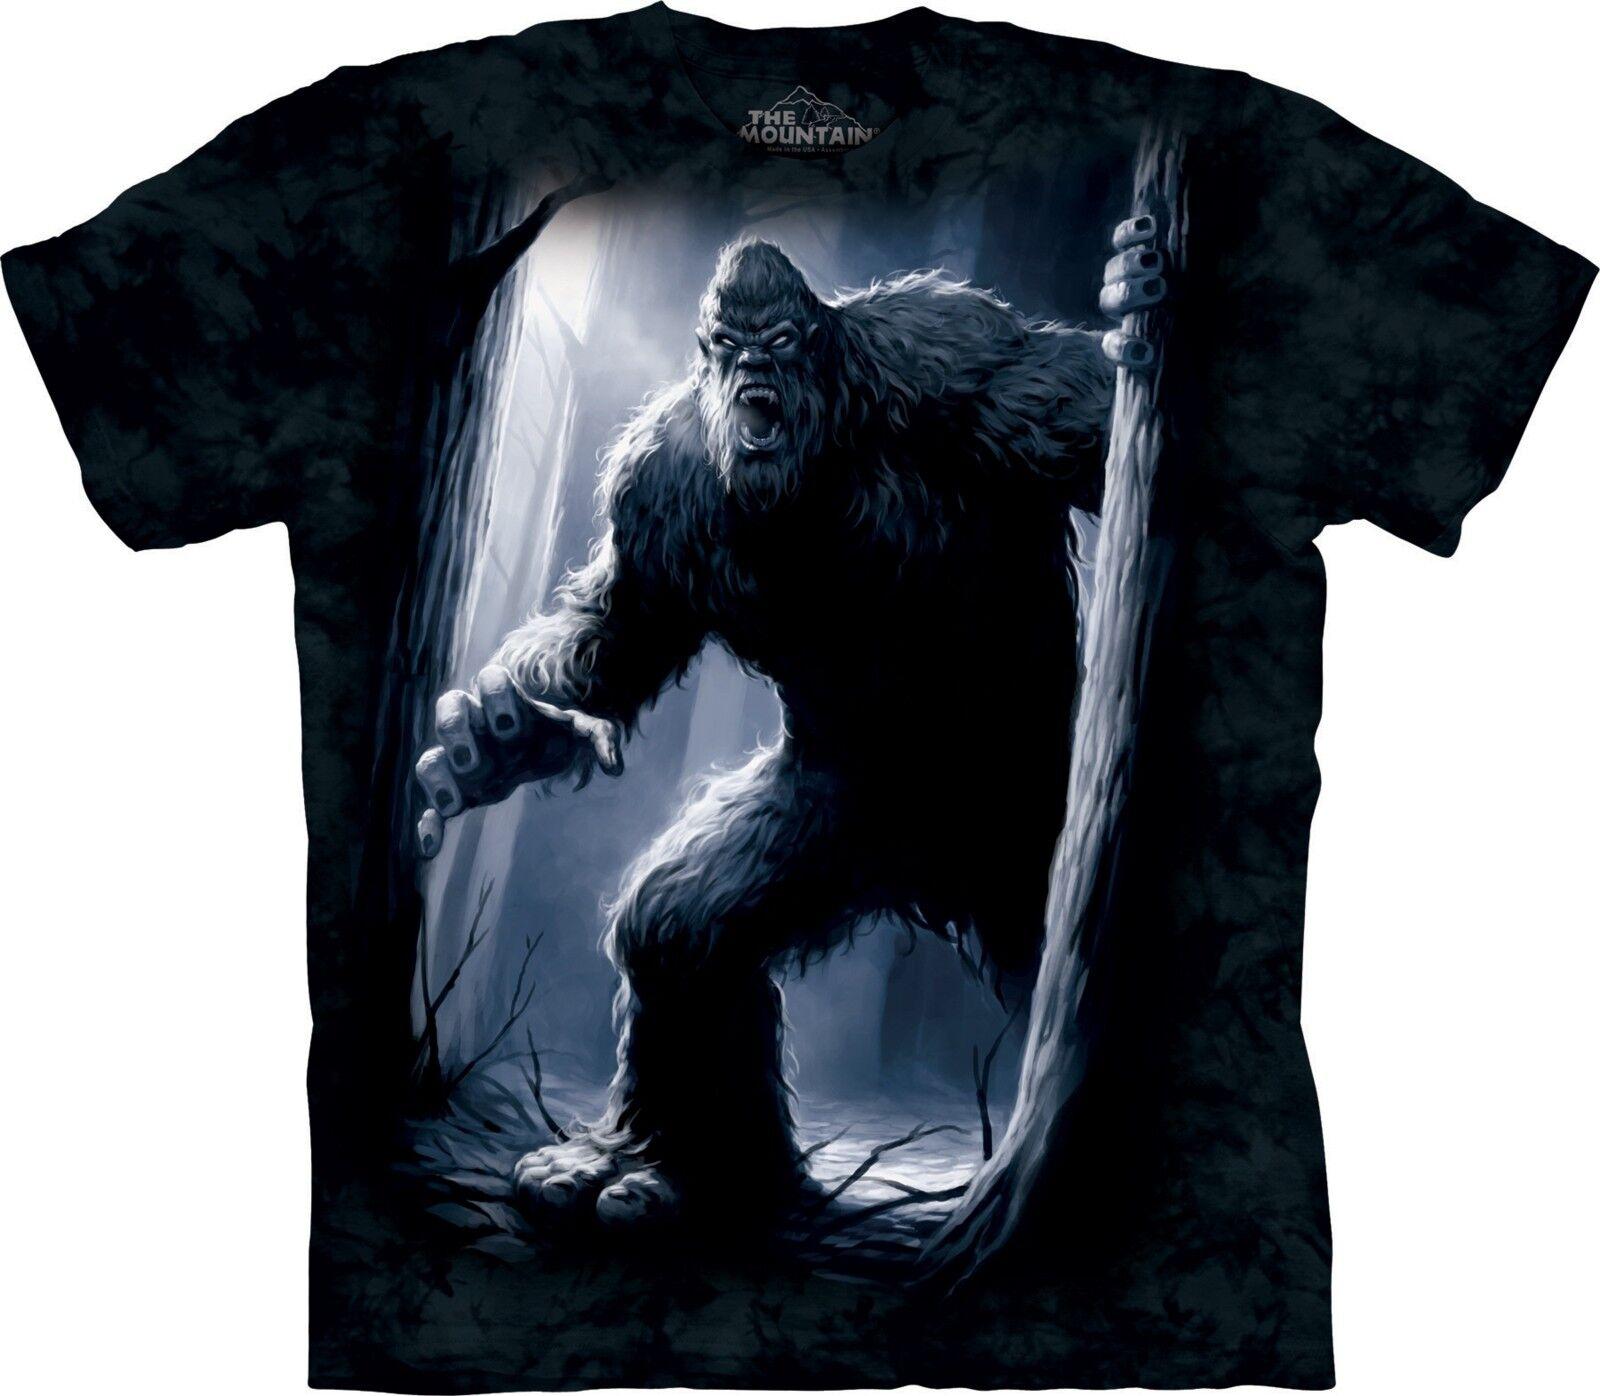 Sasquatch Fantasy T Shirt Adult Unisex The Mountain Skulbone